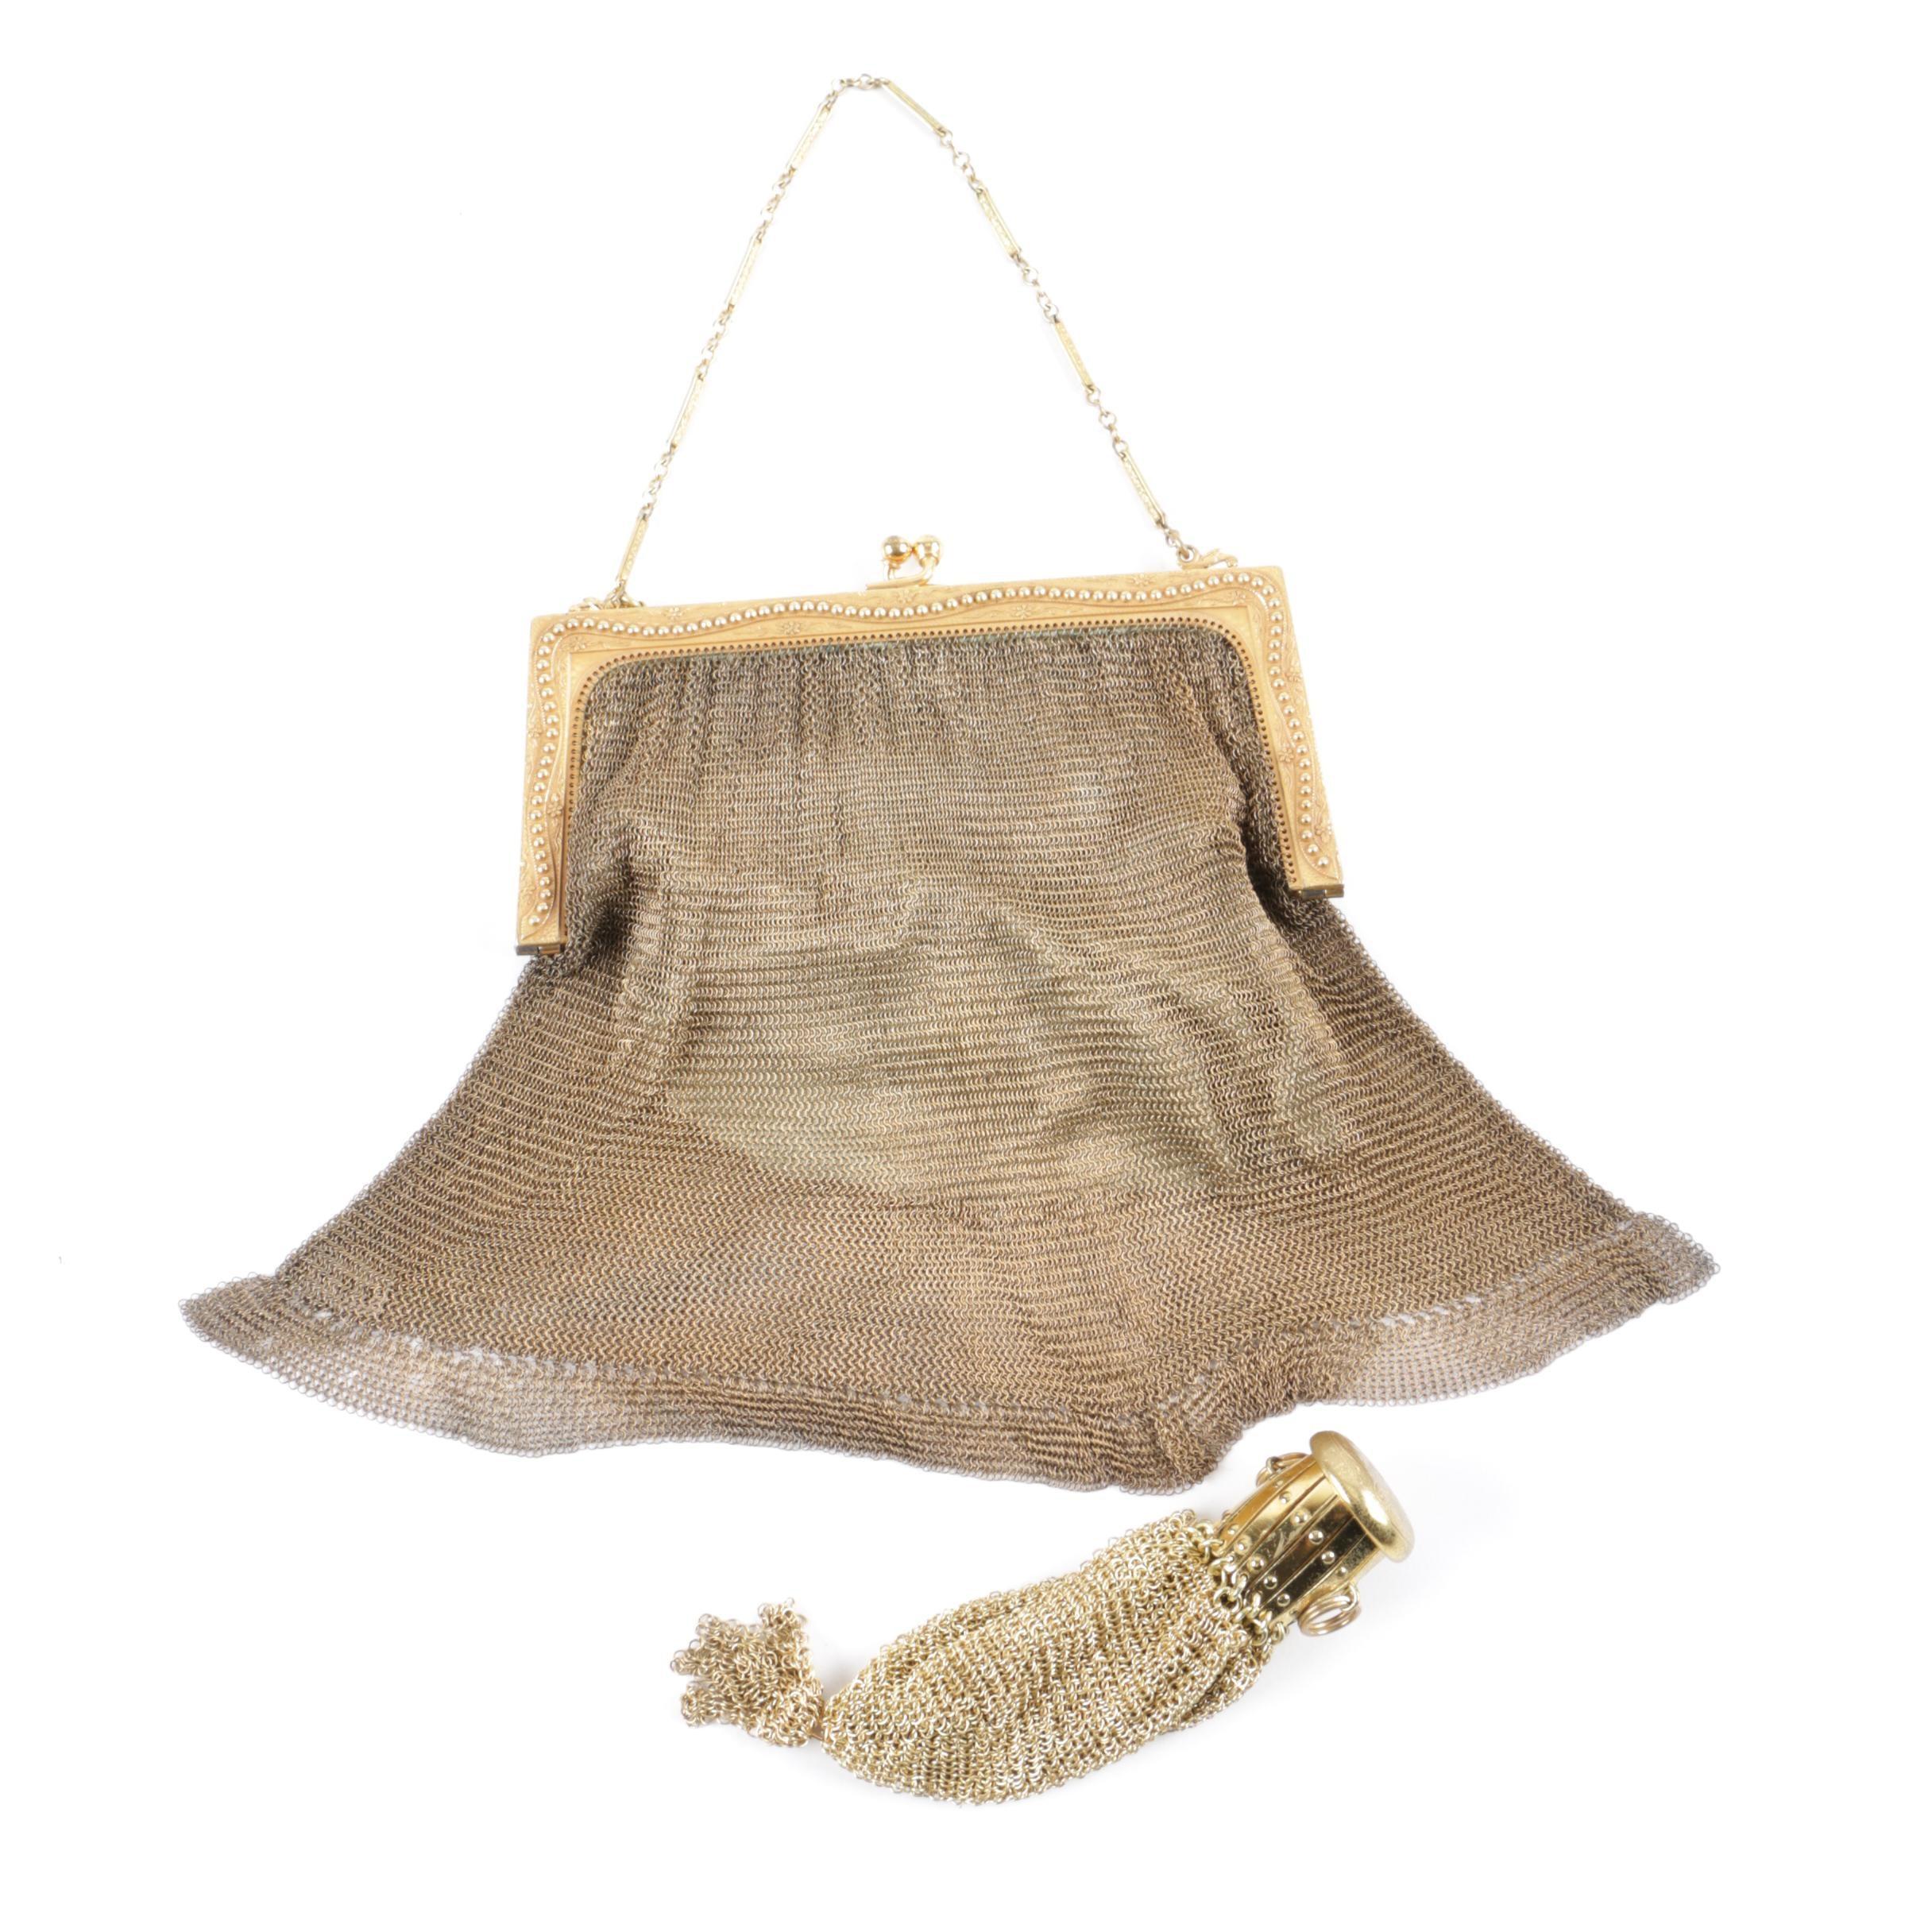 Vintage Mesh Handbags Including Whiting U0026 Davis